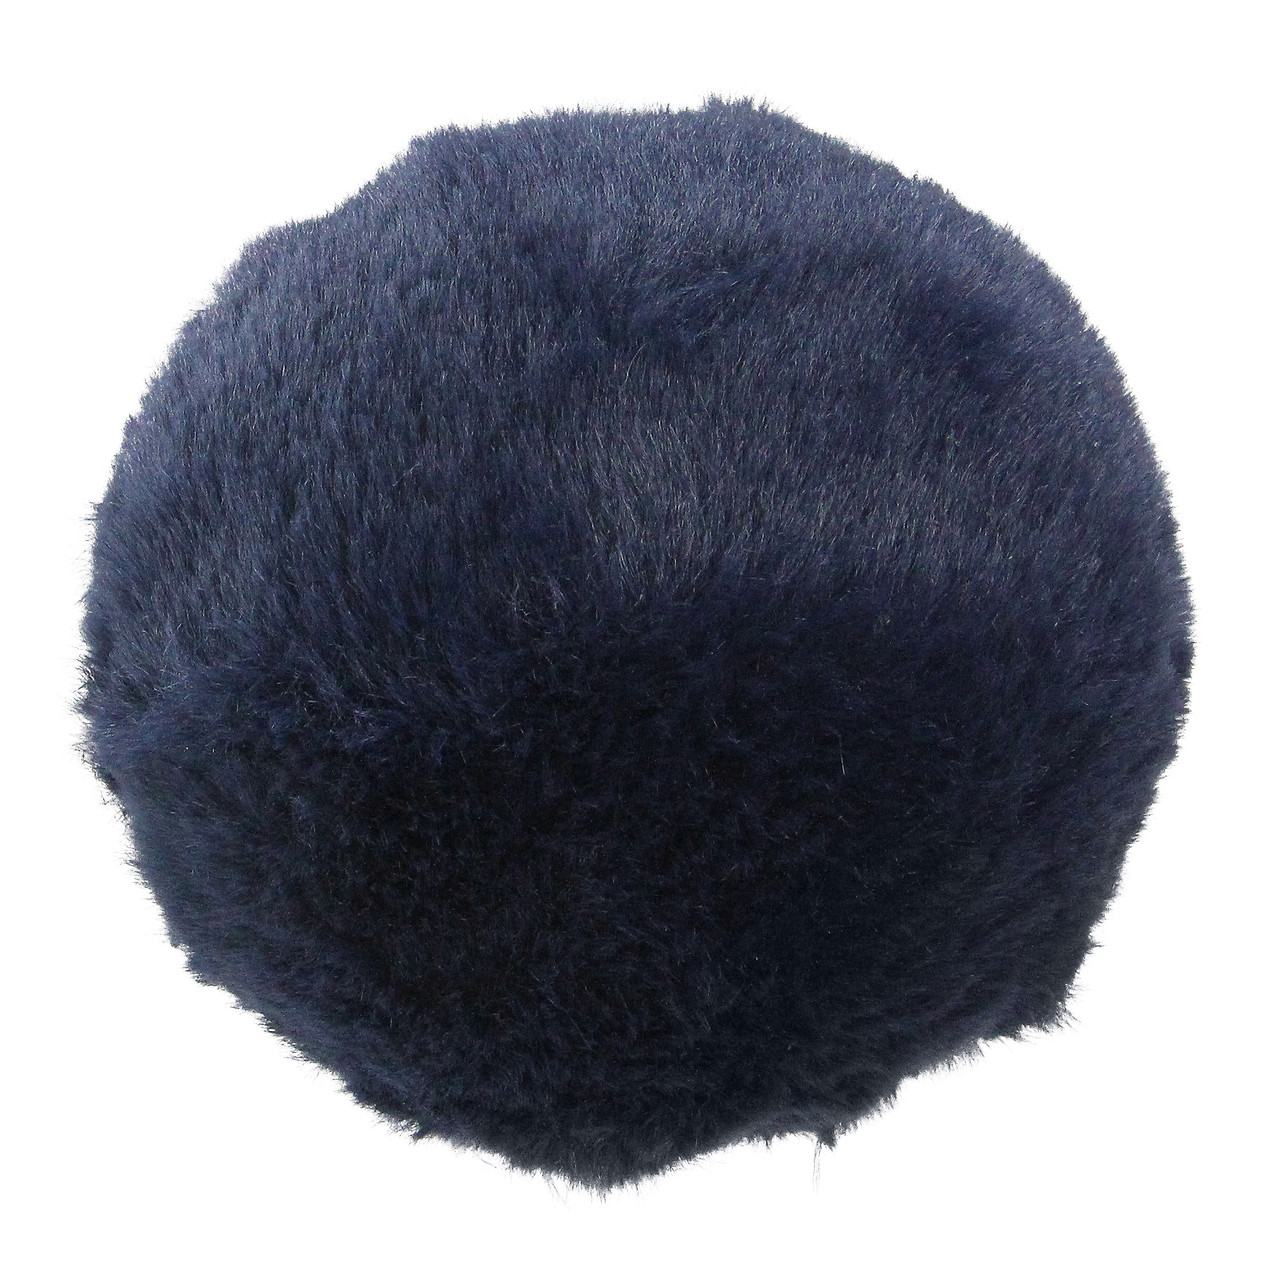 45 navy blue faux fur ball christmas ornament decoration 32627488